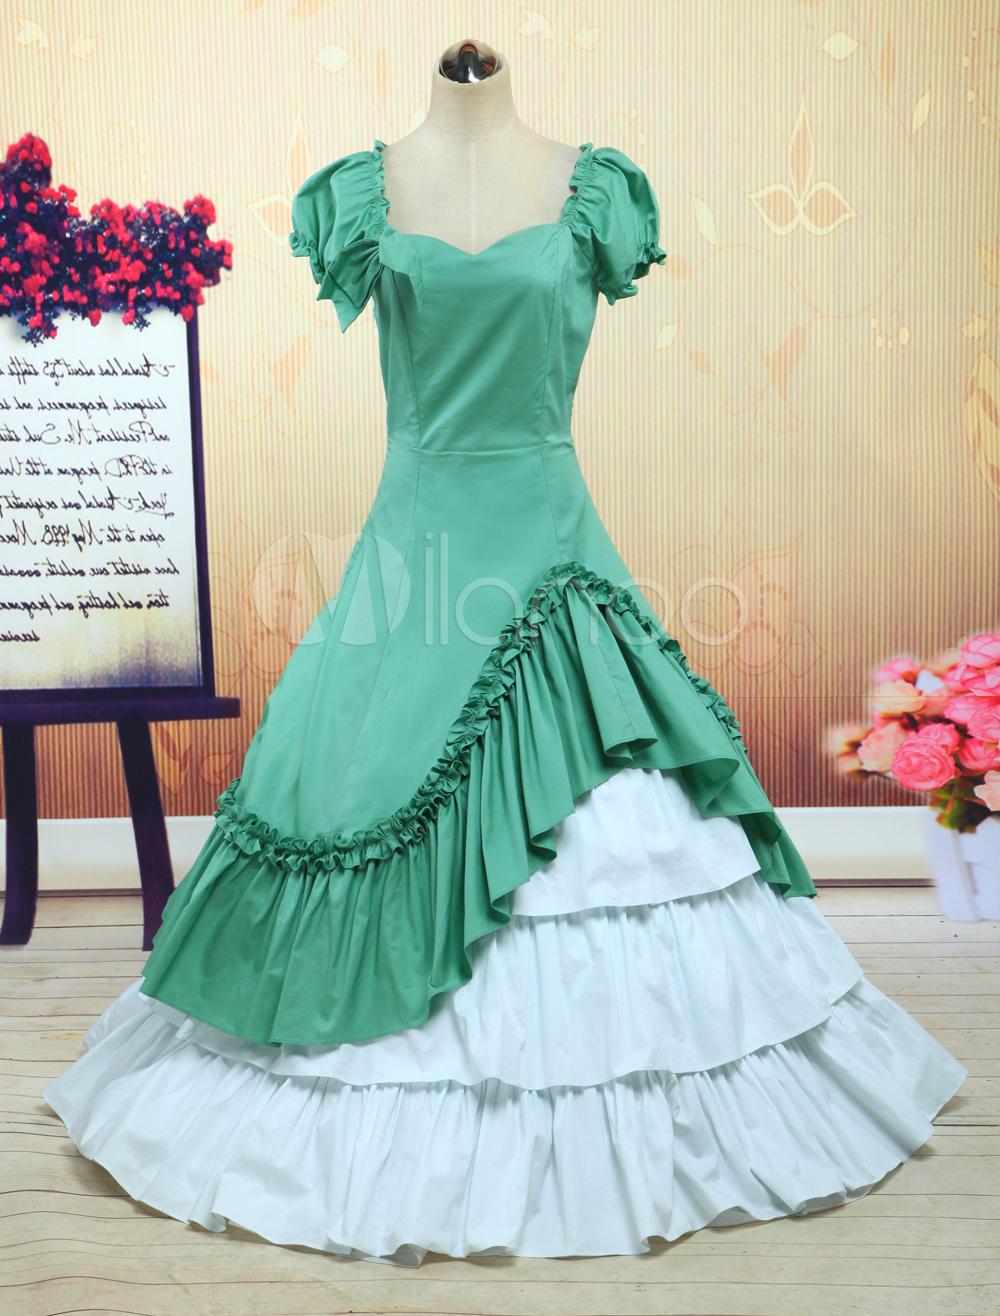 Navy Green And White Cotton Bow Classic Lolita Dress - Milanoo.com